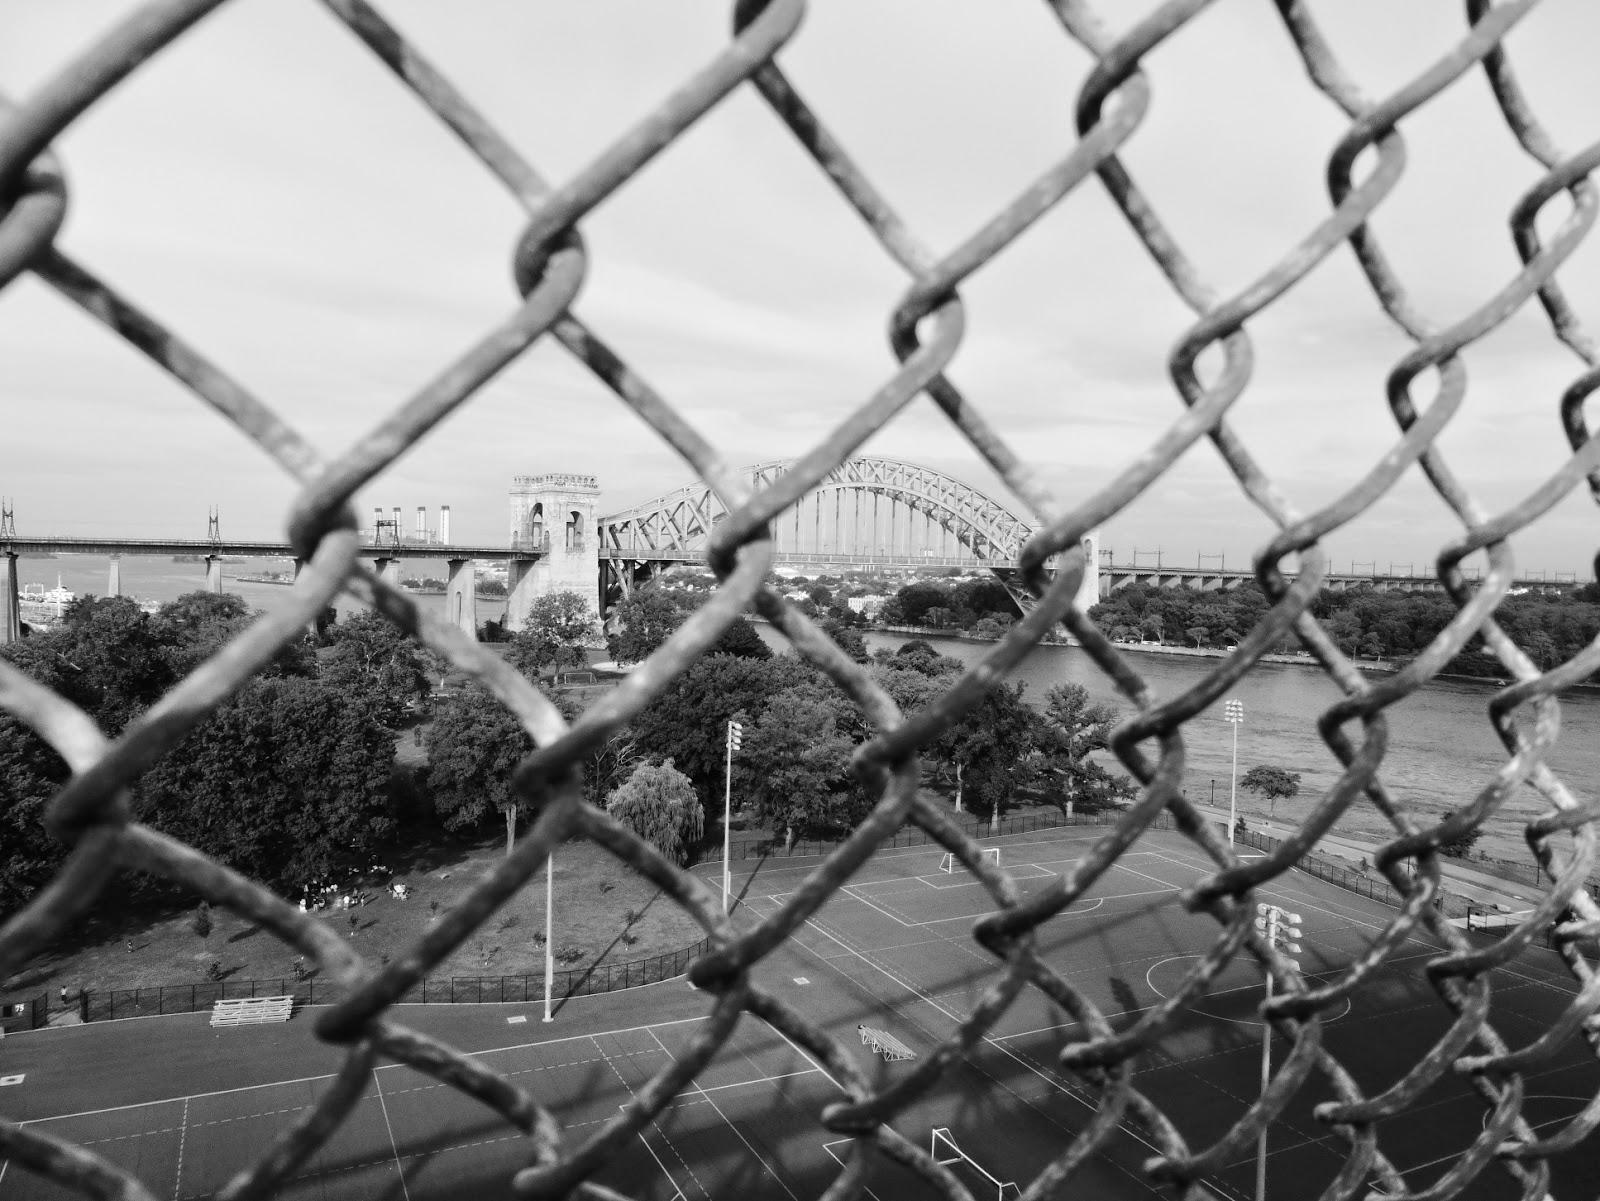 Walk on the RFK/Triborough Bridge